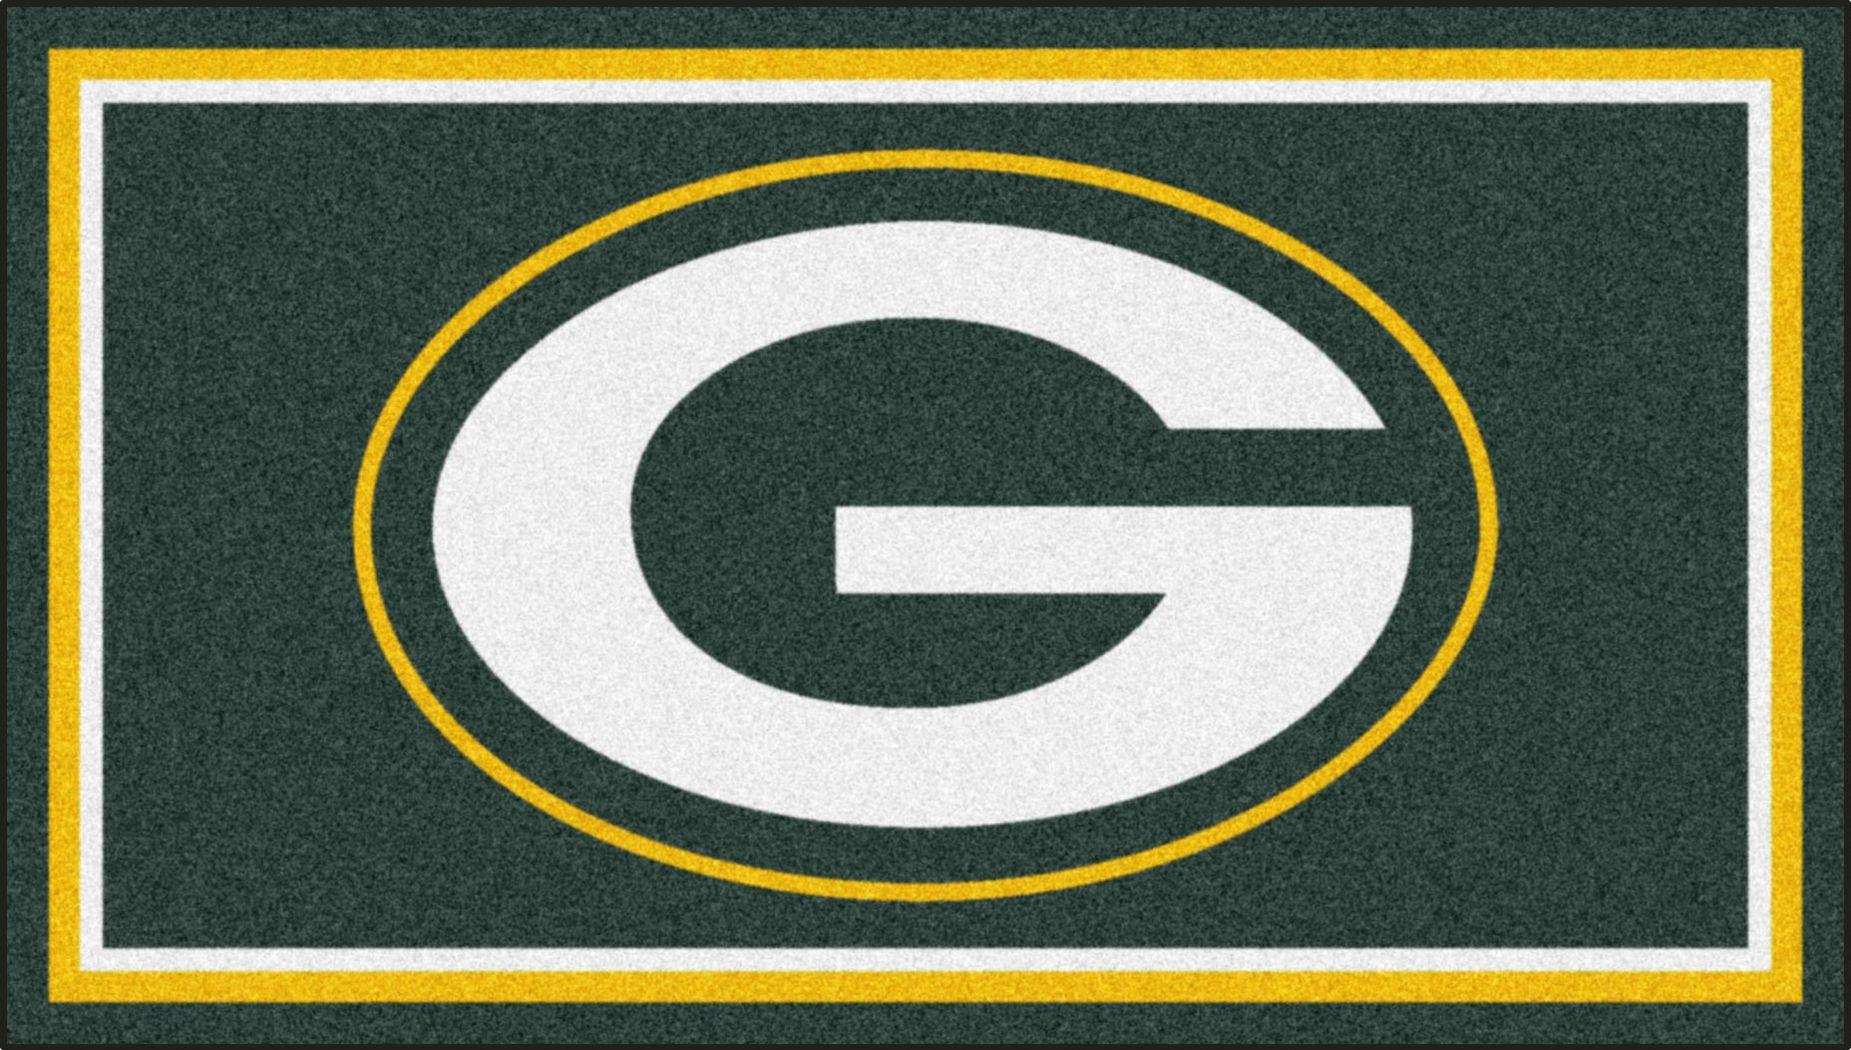 NFL Big Game Green Bay Packers 3' x 5' Rug